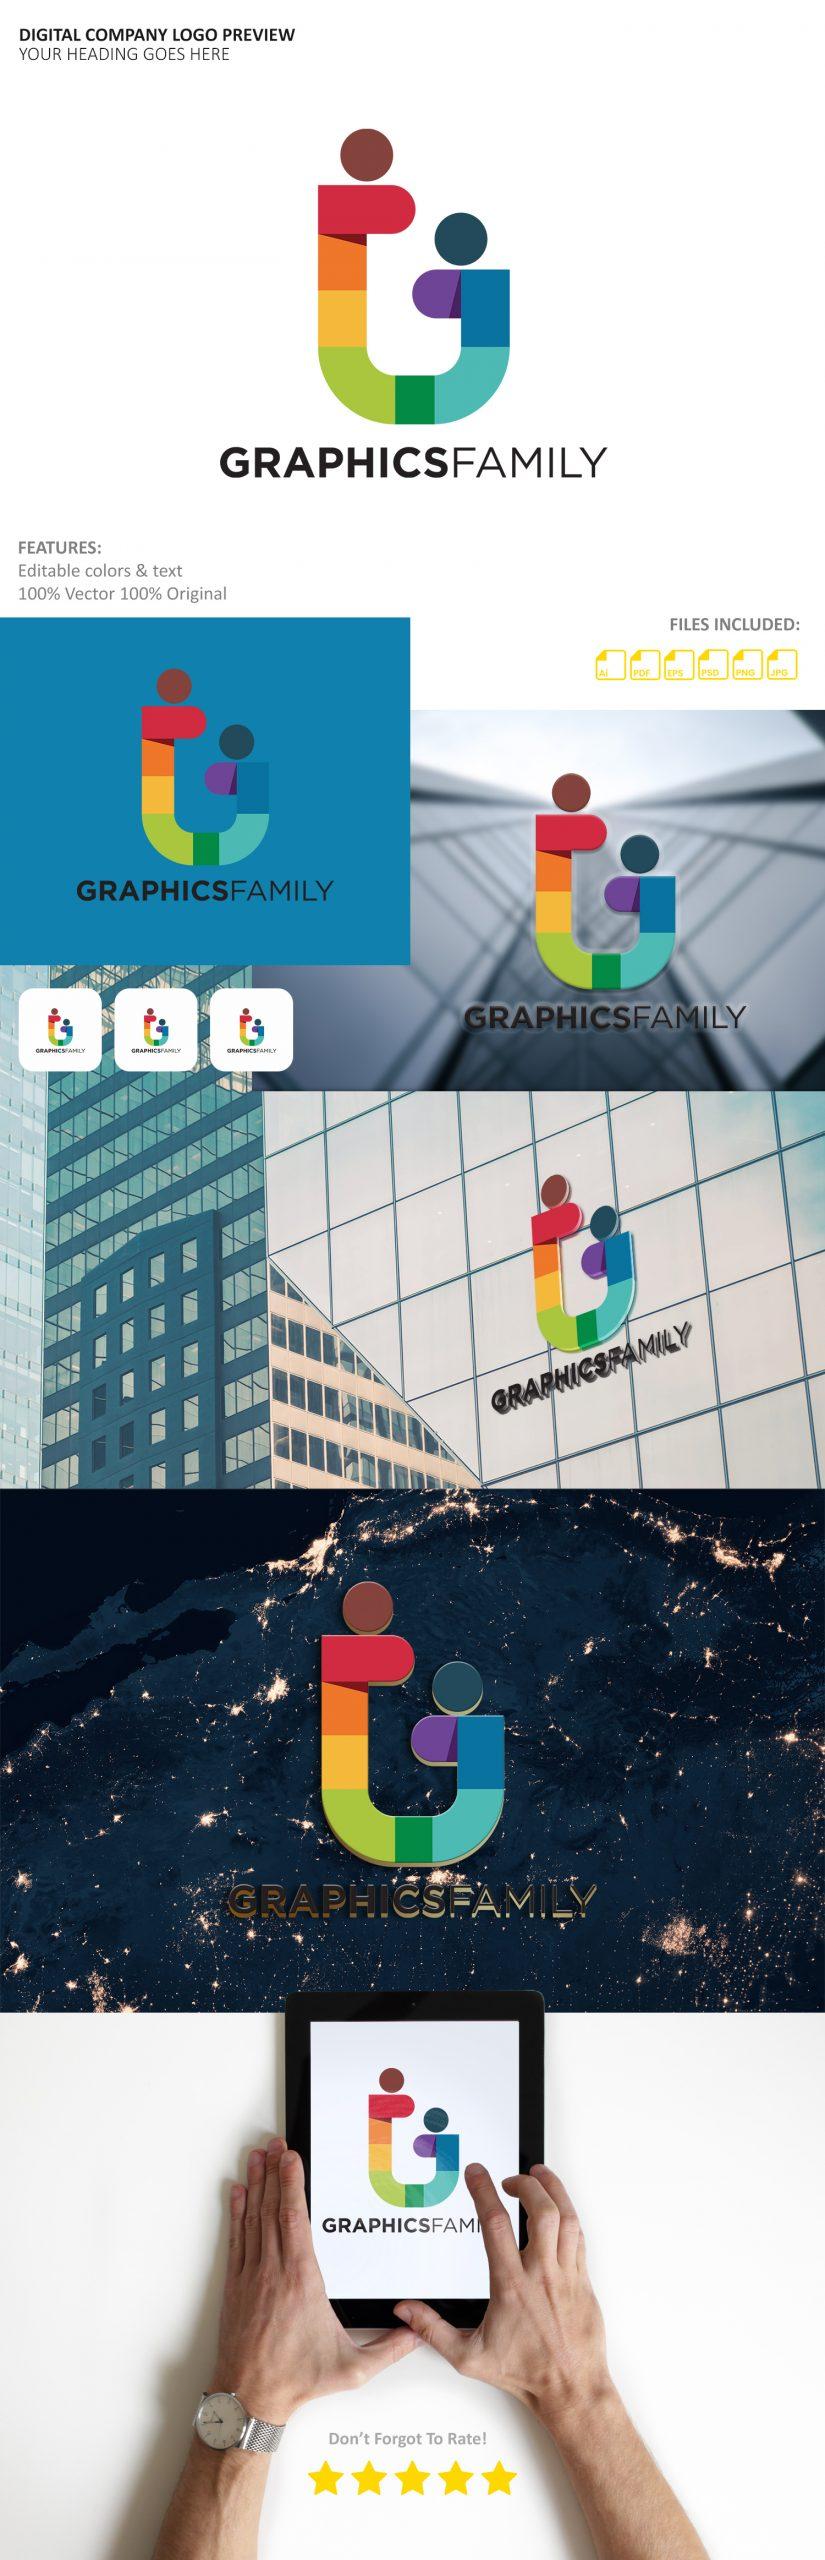 Digital Company Logo Preview Mockup